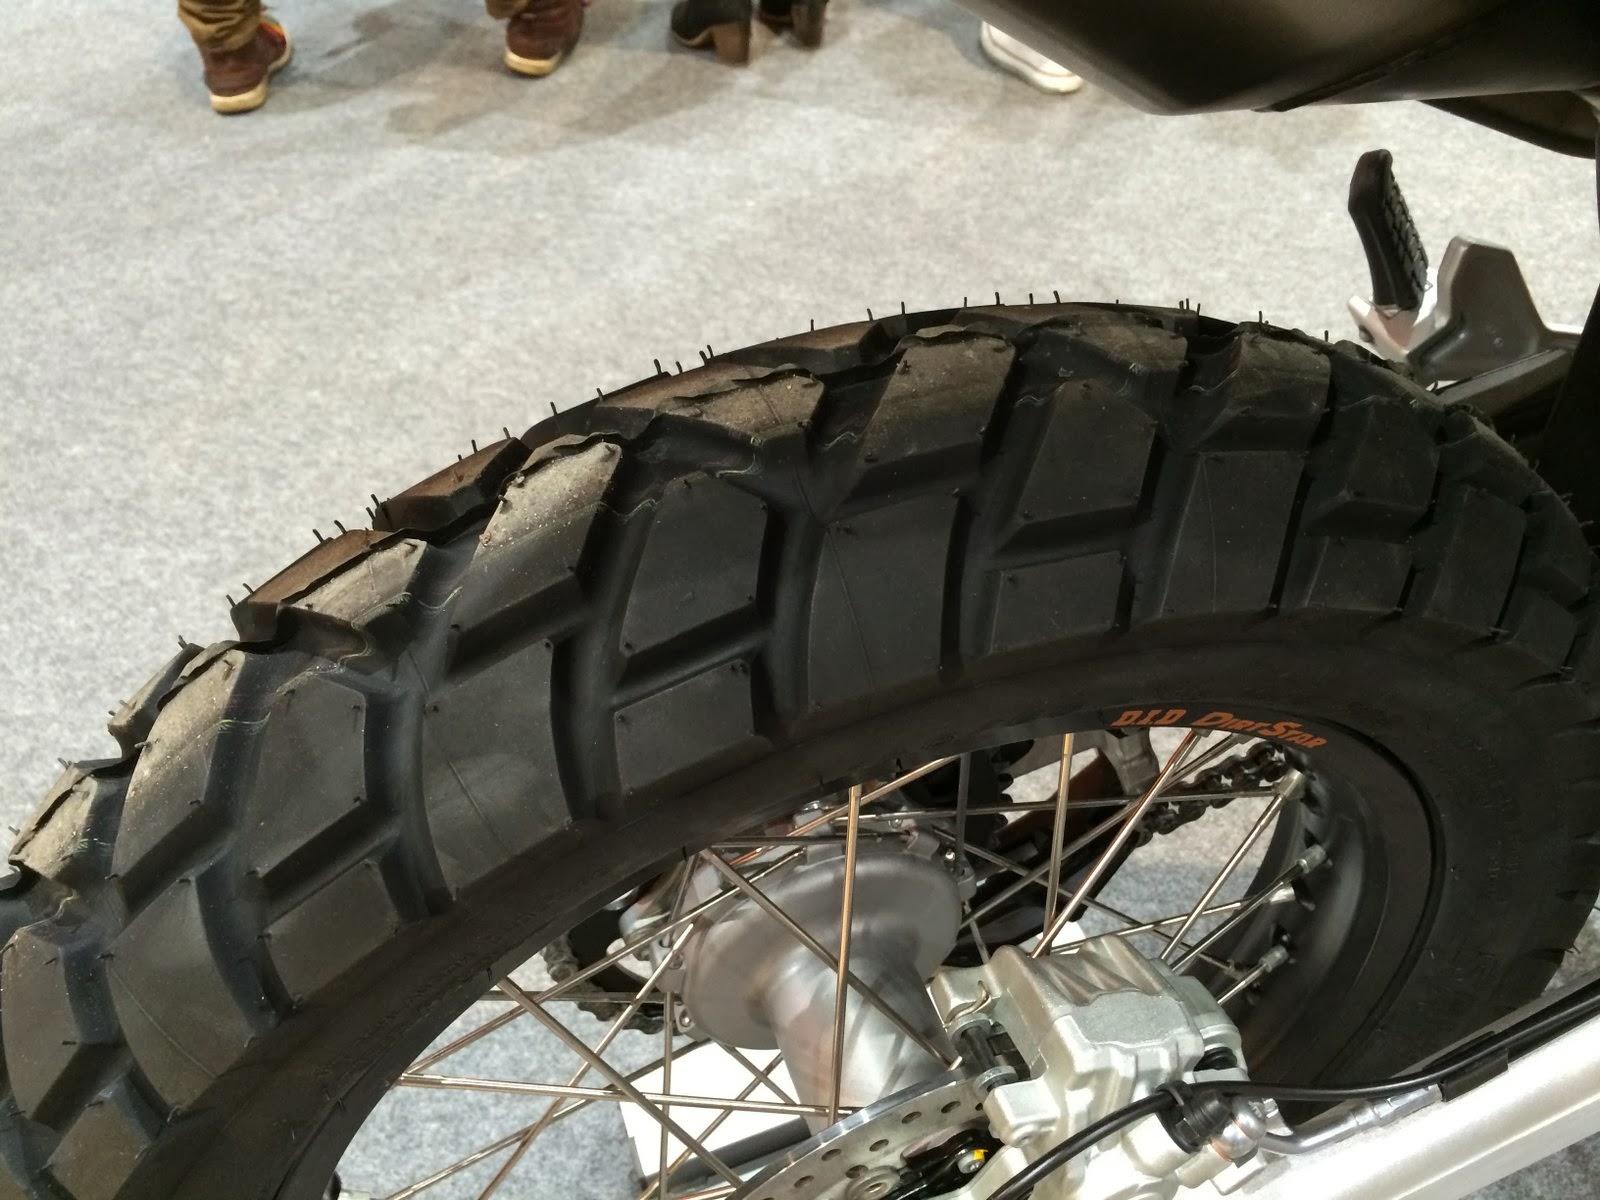 2014 KTM 690 Eduroro R rear tyre pattern